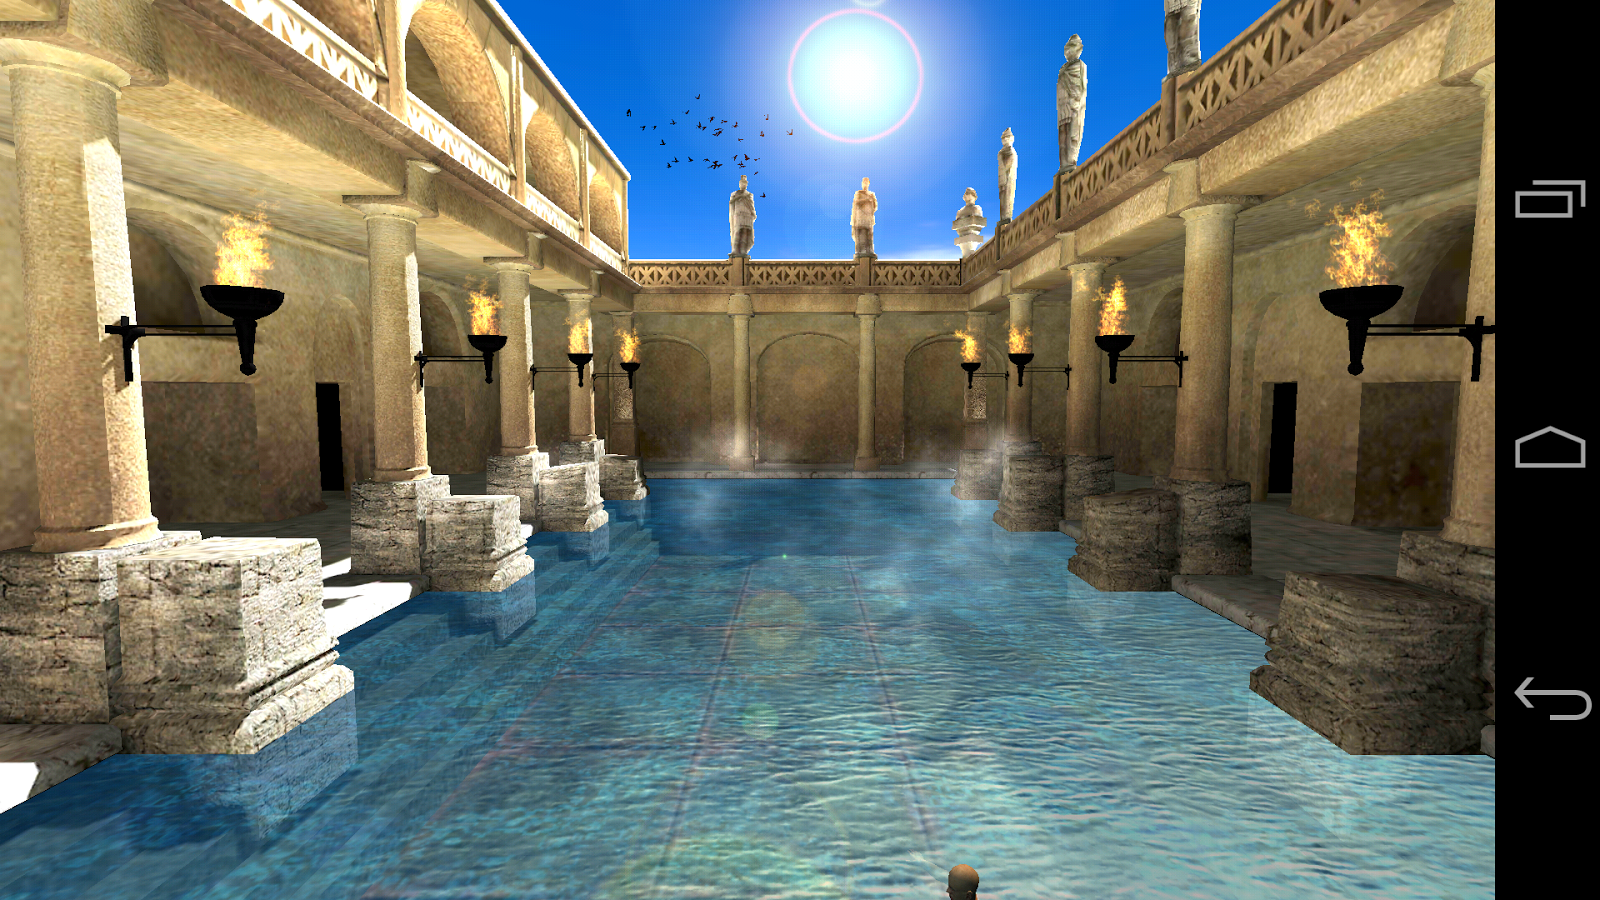 Bathroom specialists product gallery baths downloader -  Roman Bath 3d Live Wallpaper 1 0 0 Screenshot 9